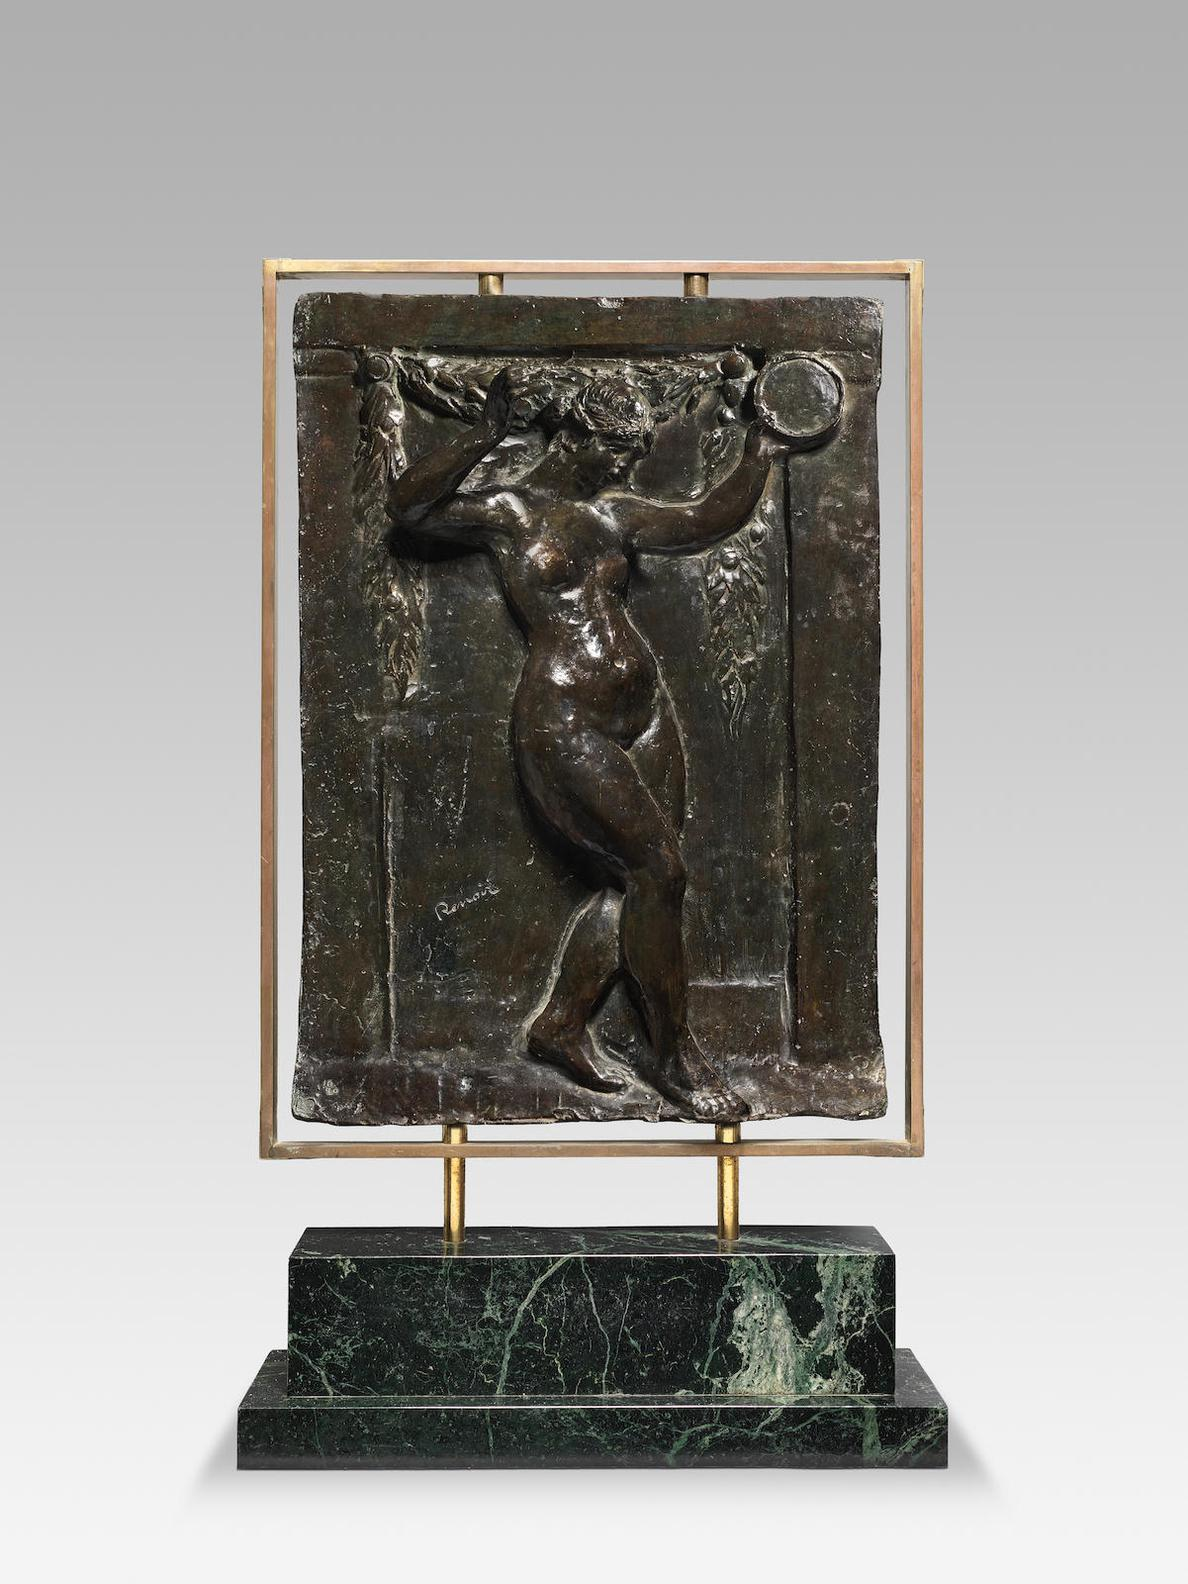 Pierre-Auguste Renoir-After Pierre-Auguste Renoir - Danseuse Au Tambourin I-1950